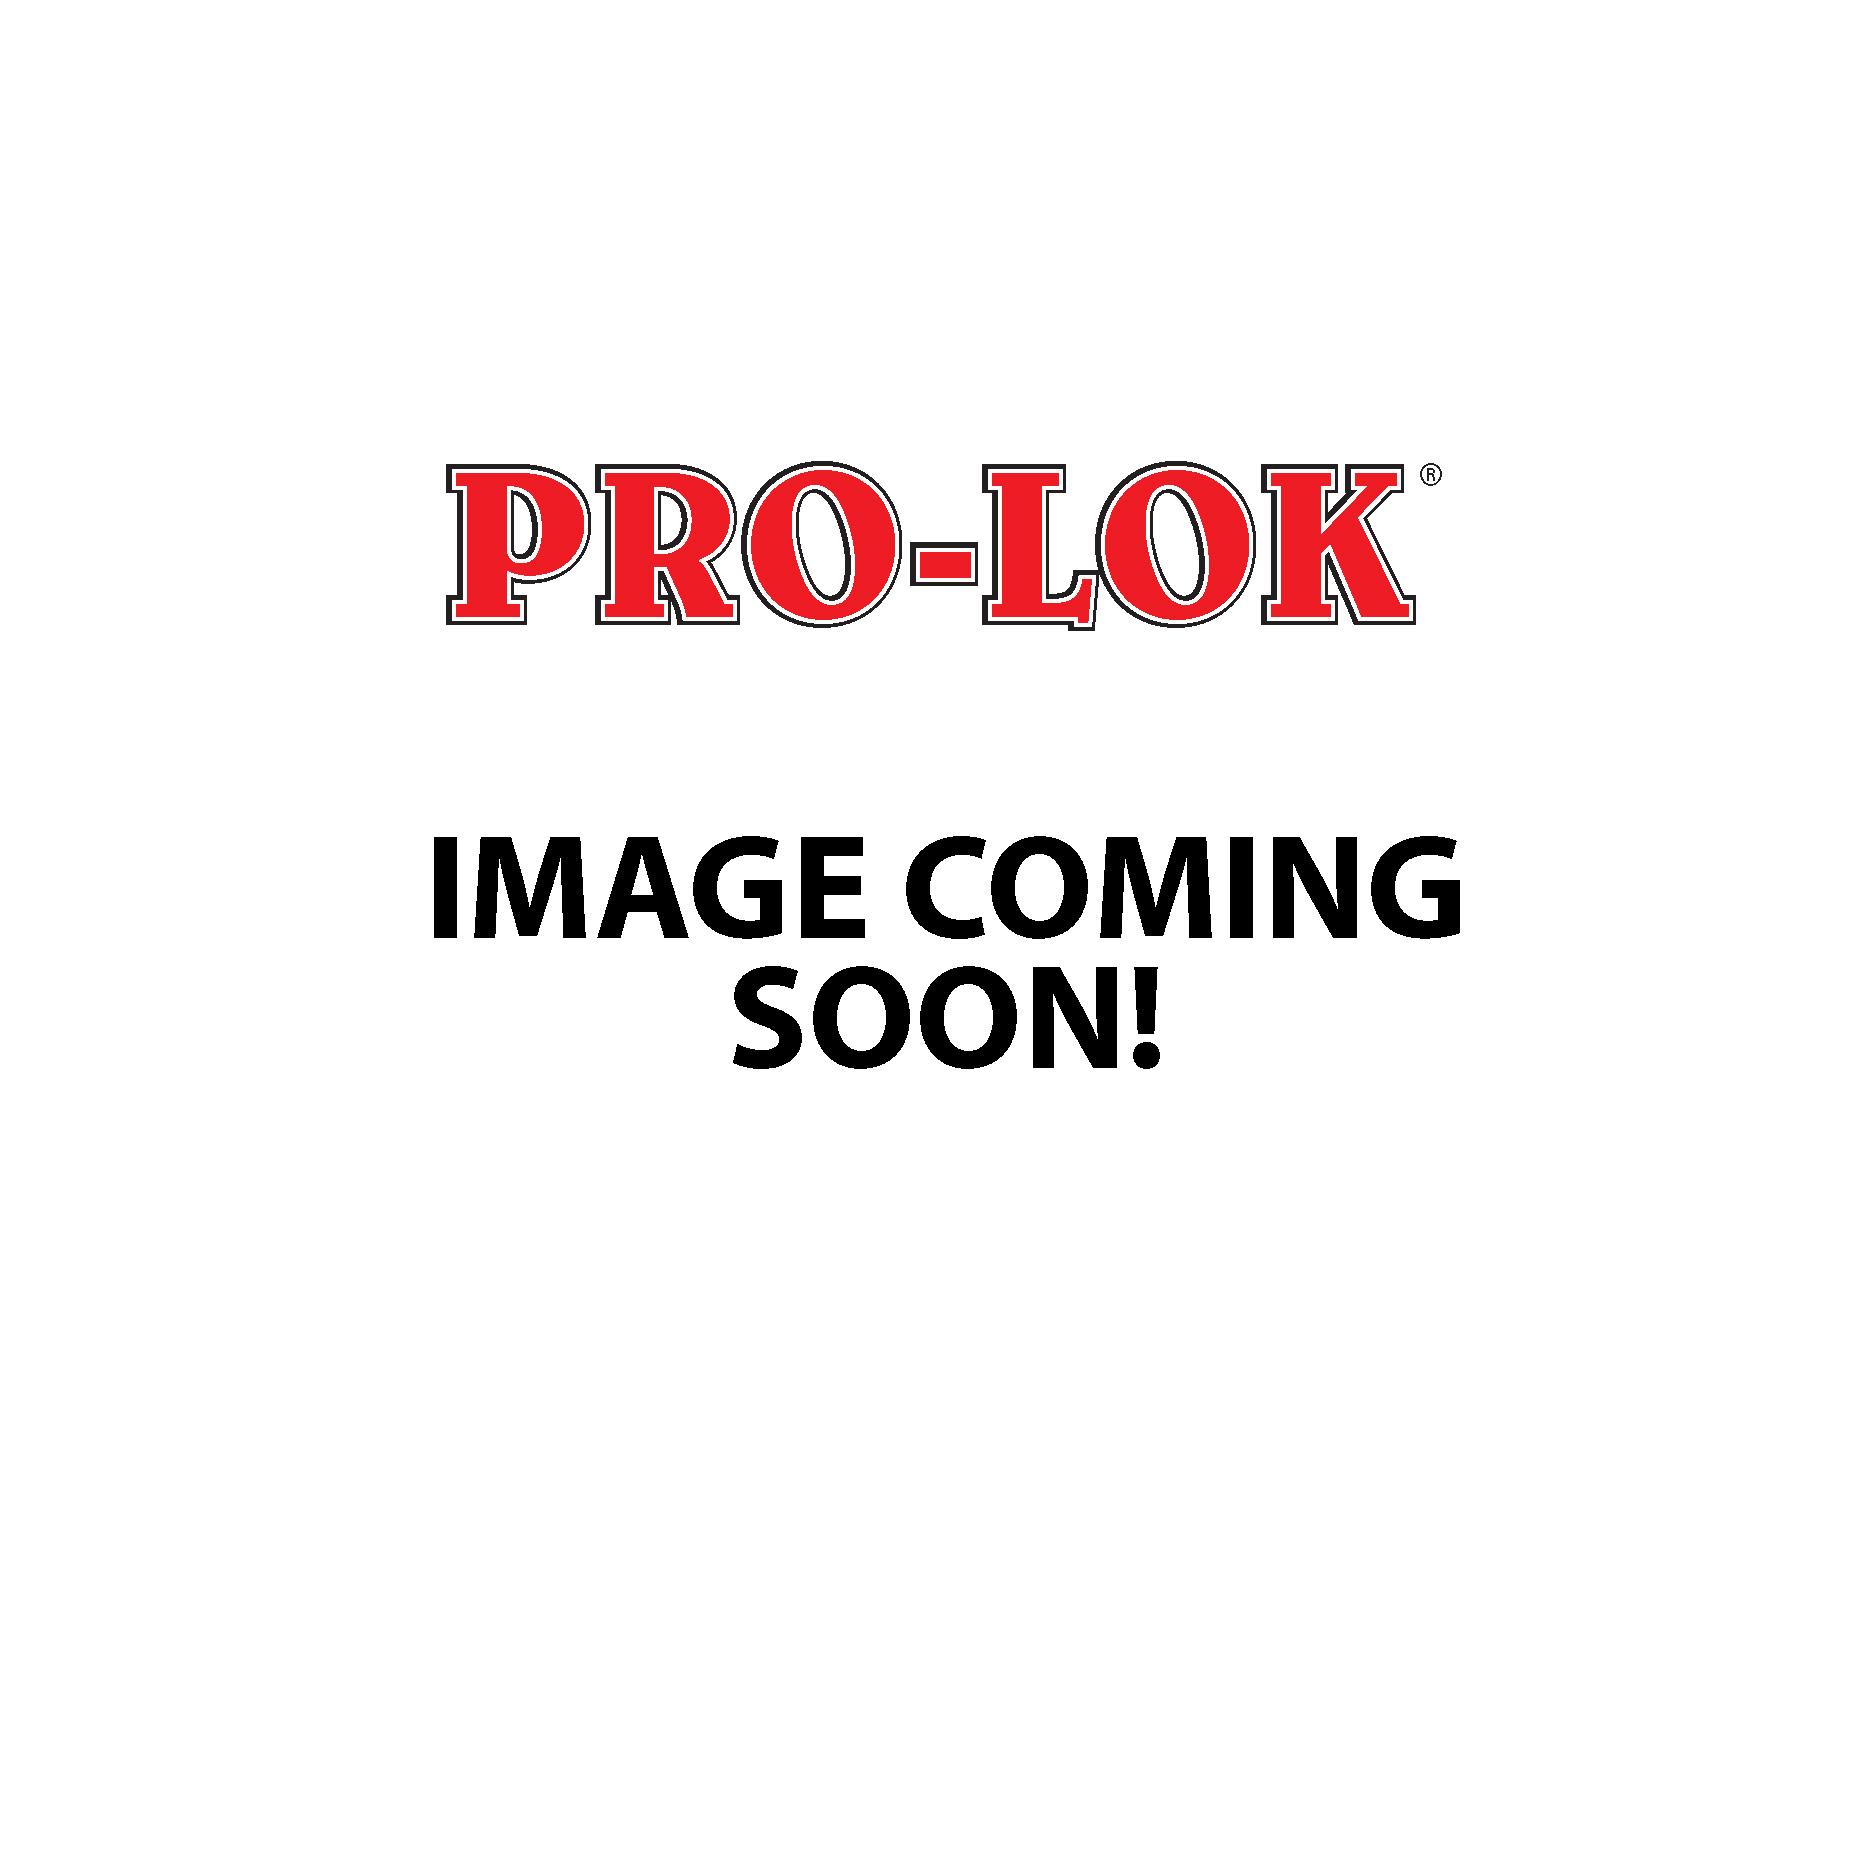 corbin russwin templates - corbin russwin access 700 ml 20700 flat plates pro lok